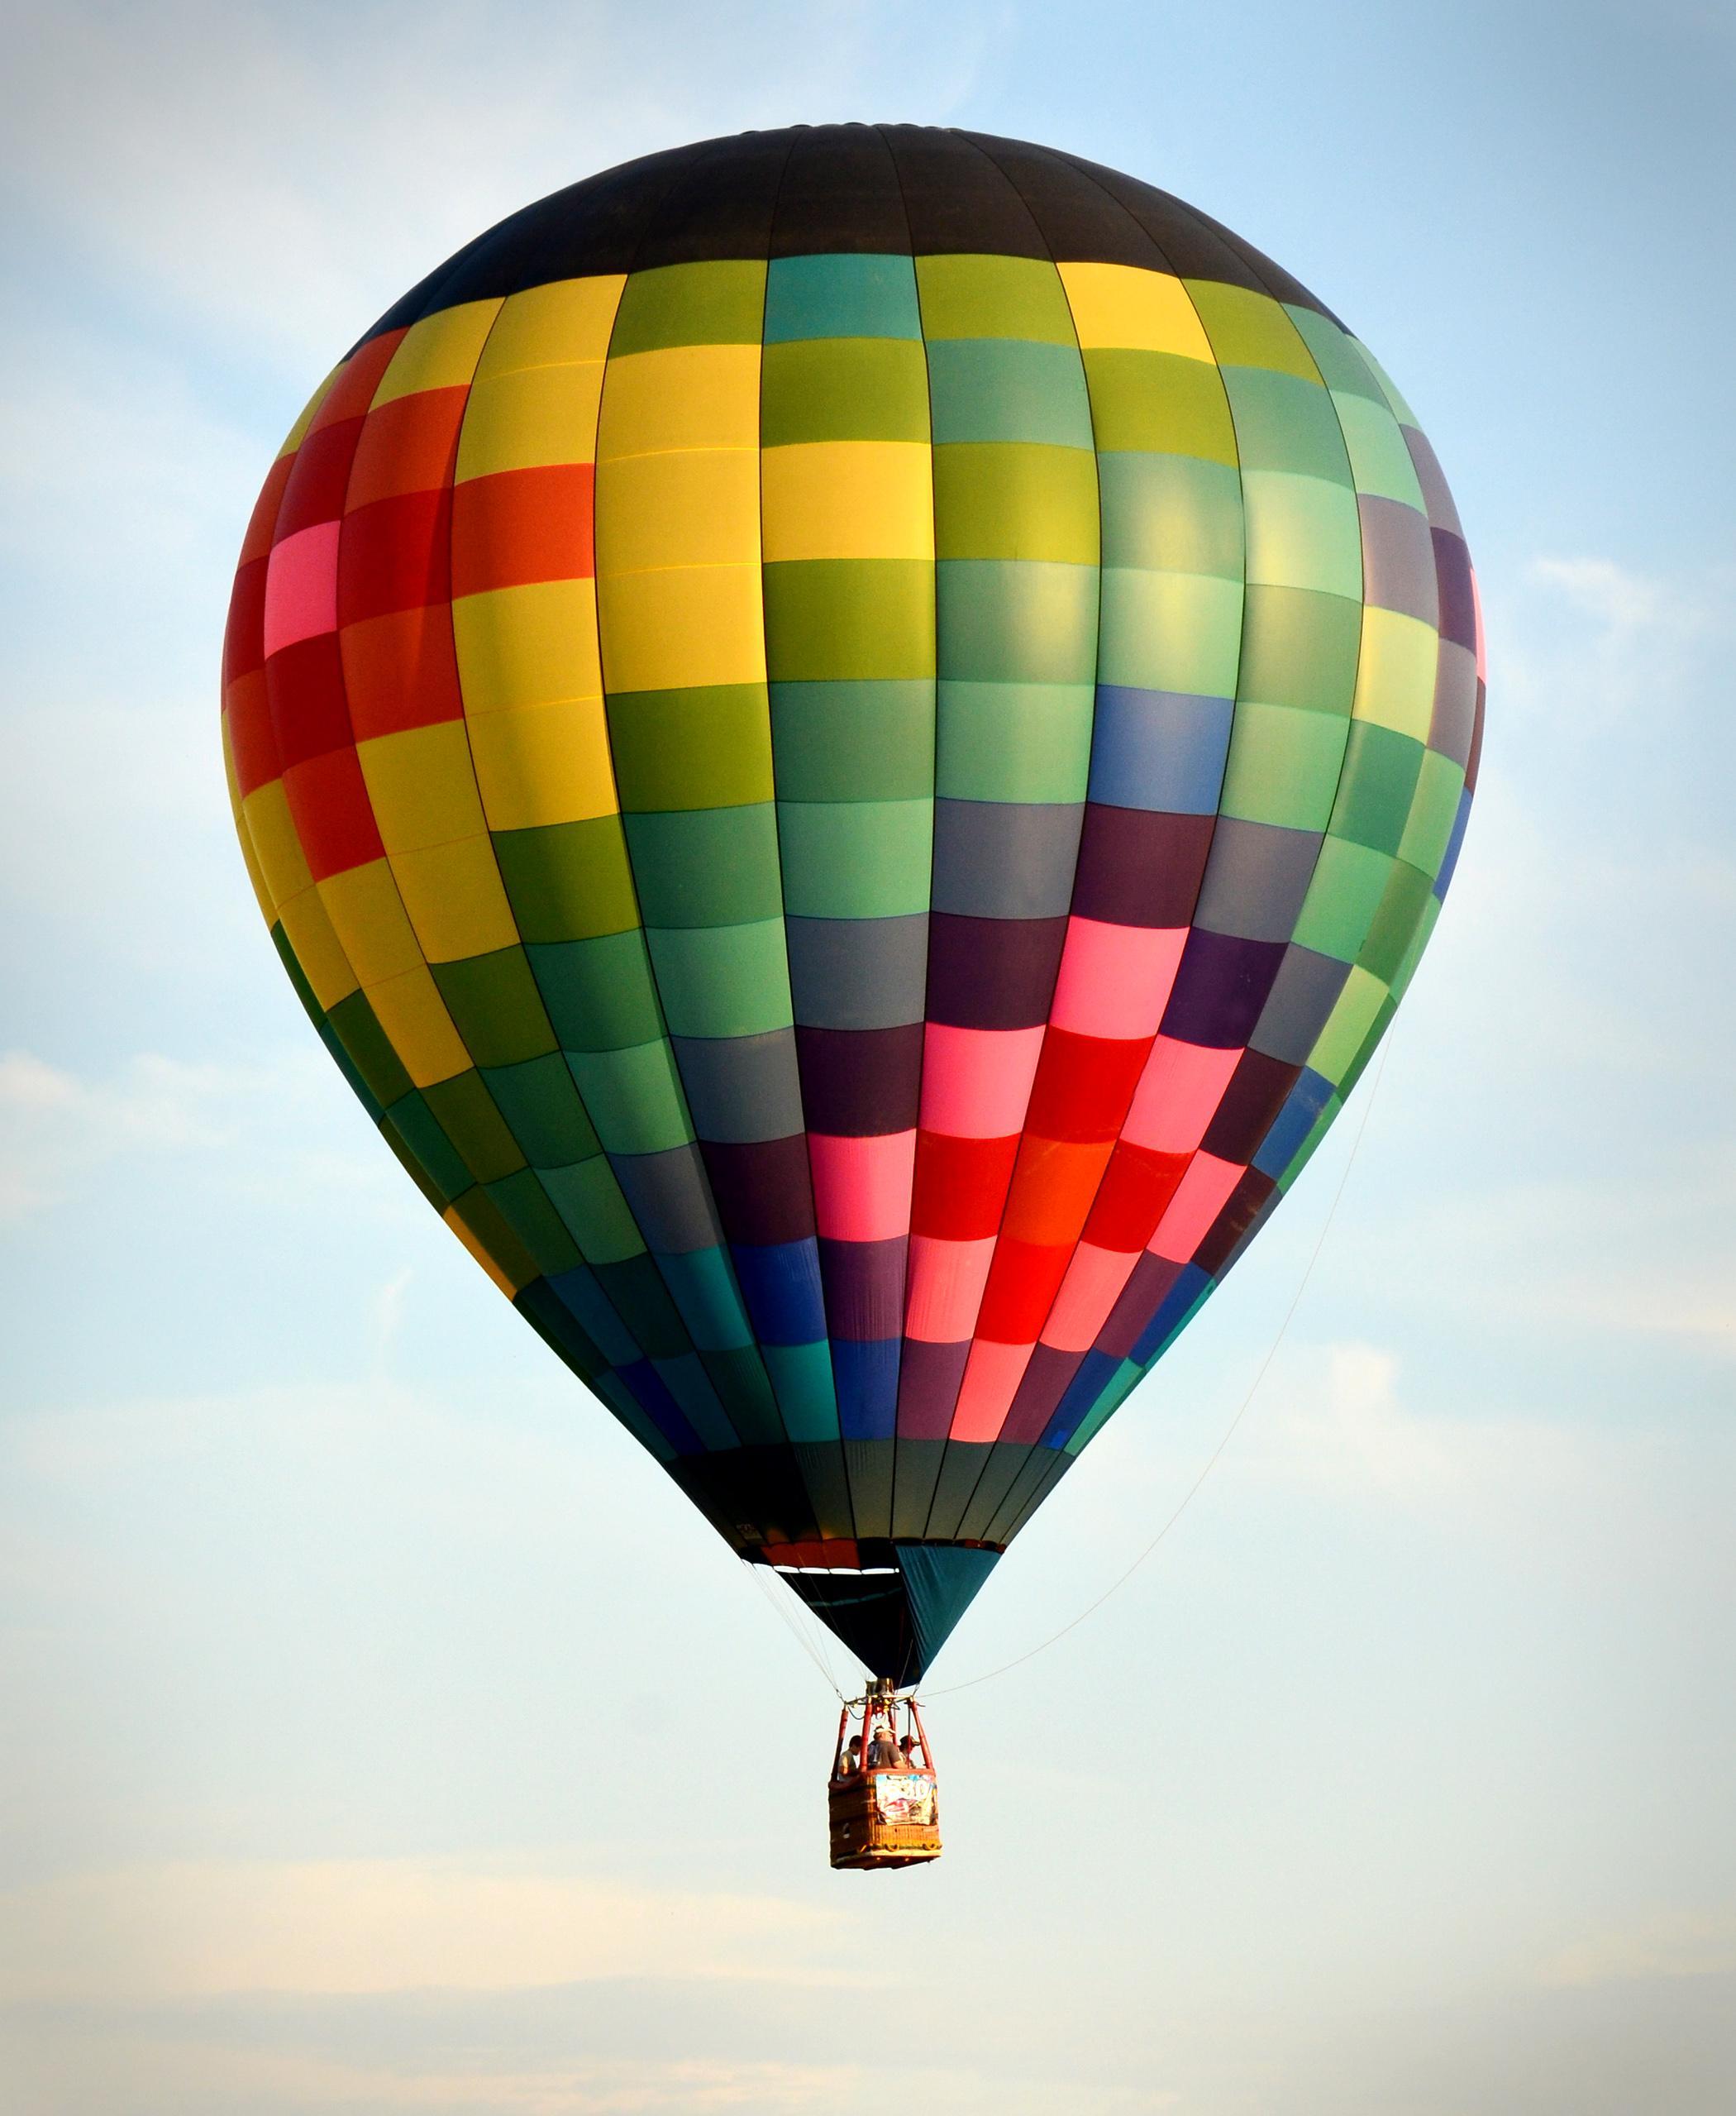 Slideshow: Hopkins County Hot-Air Balloon Rally | 88.9 KETR